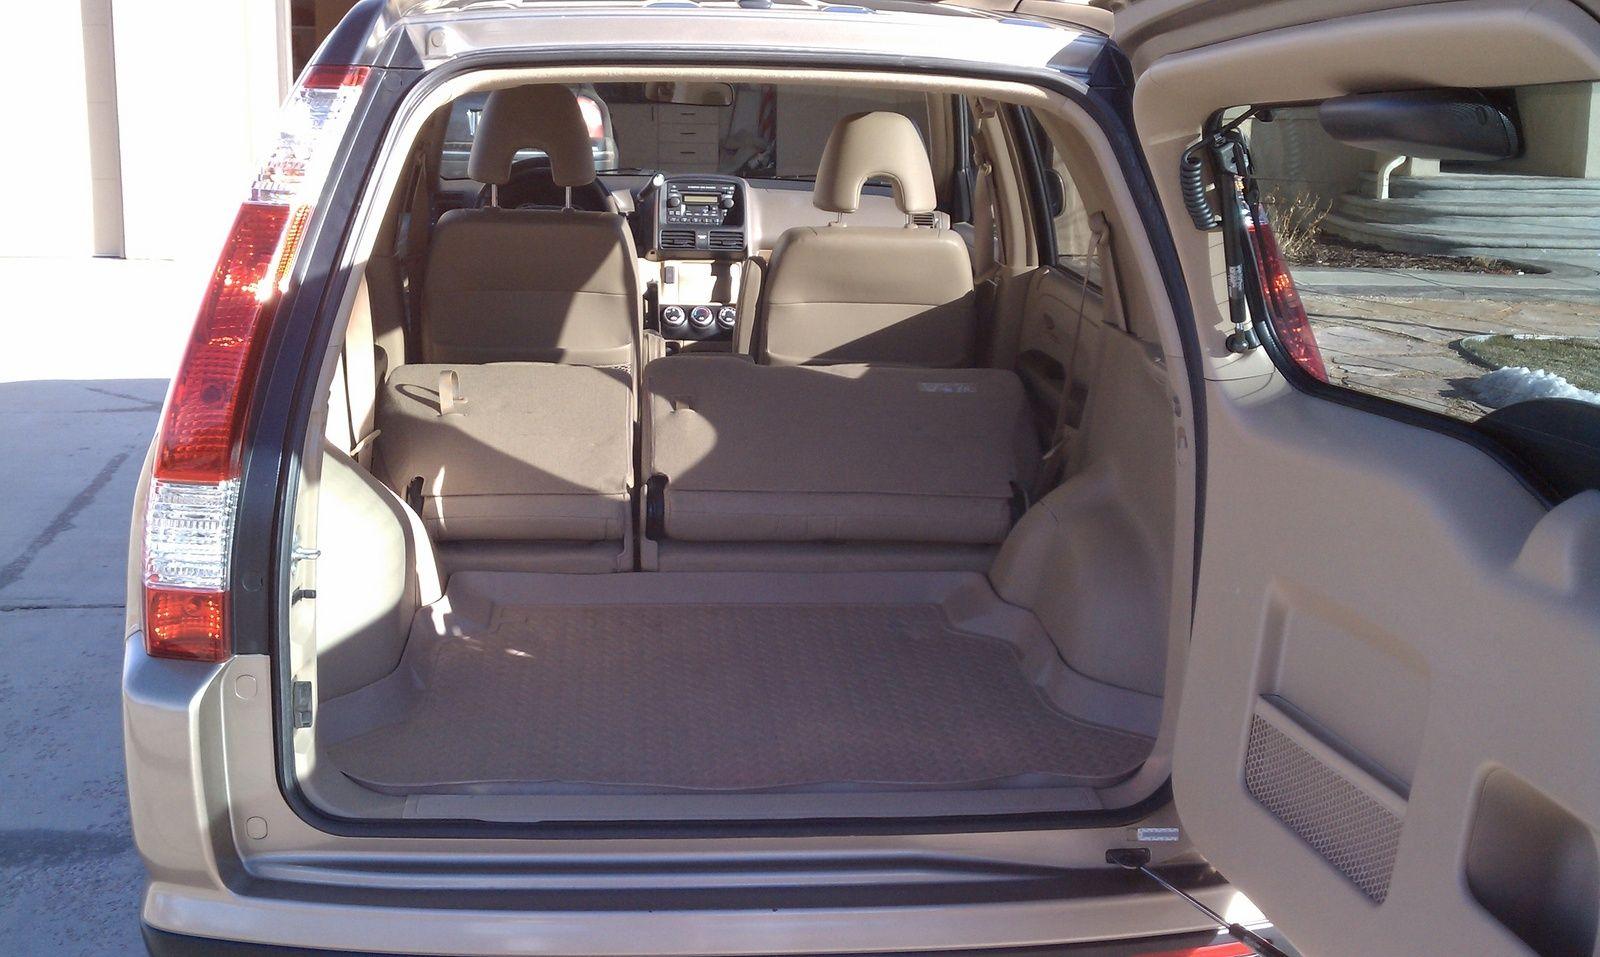 Honda Crv 2005 Interior Buscar Con Google Prndl Honda Crv